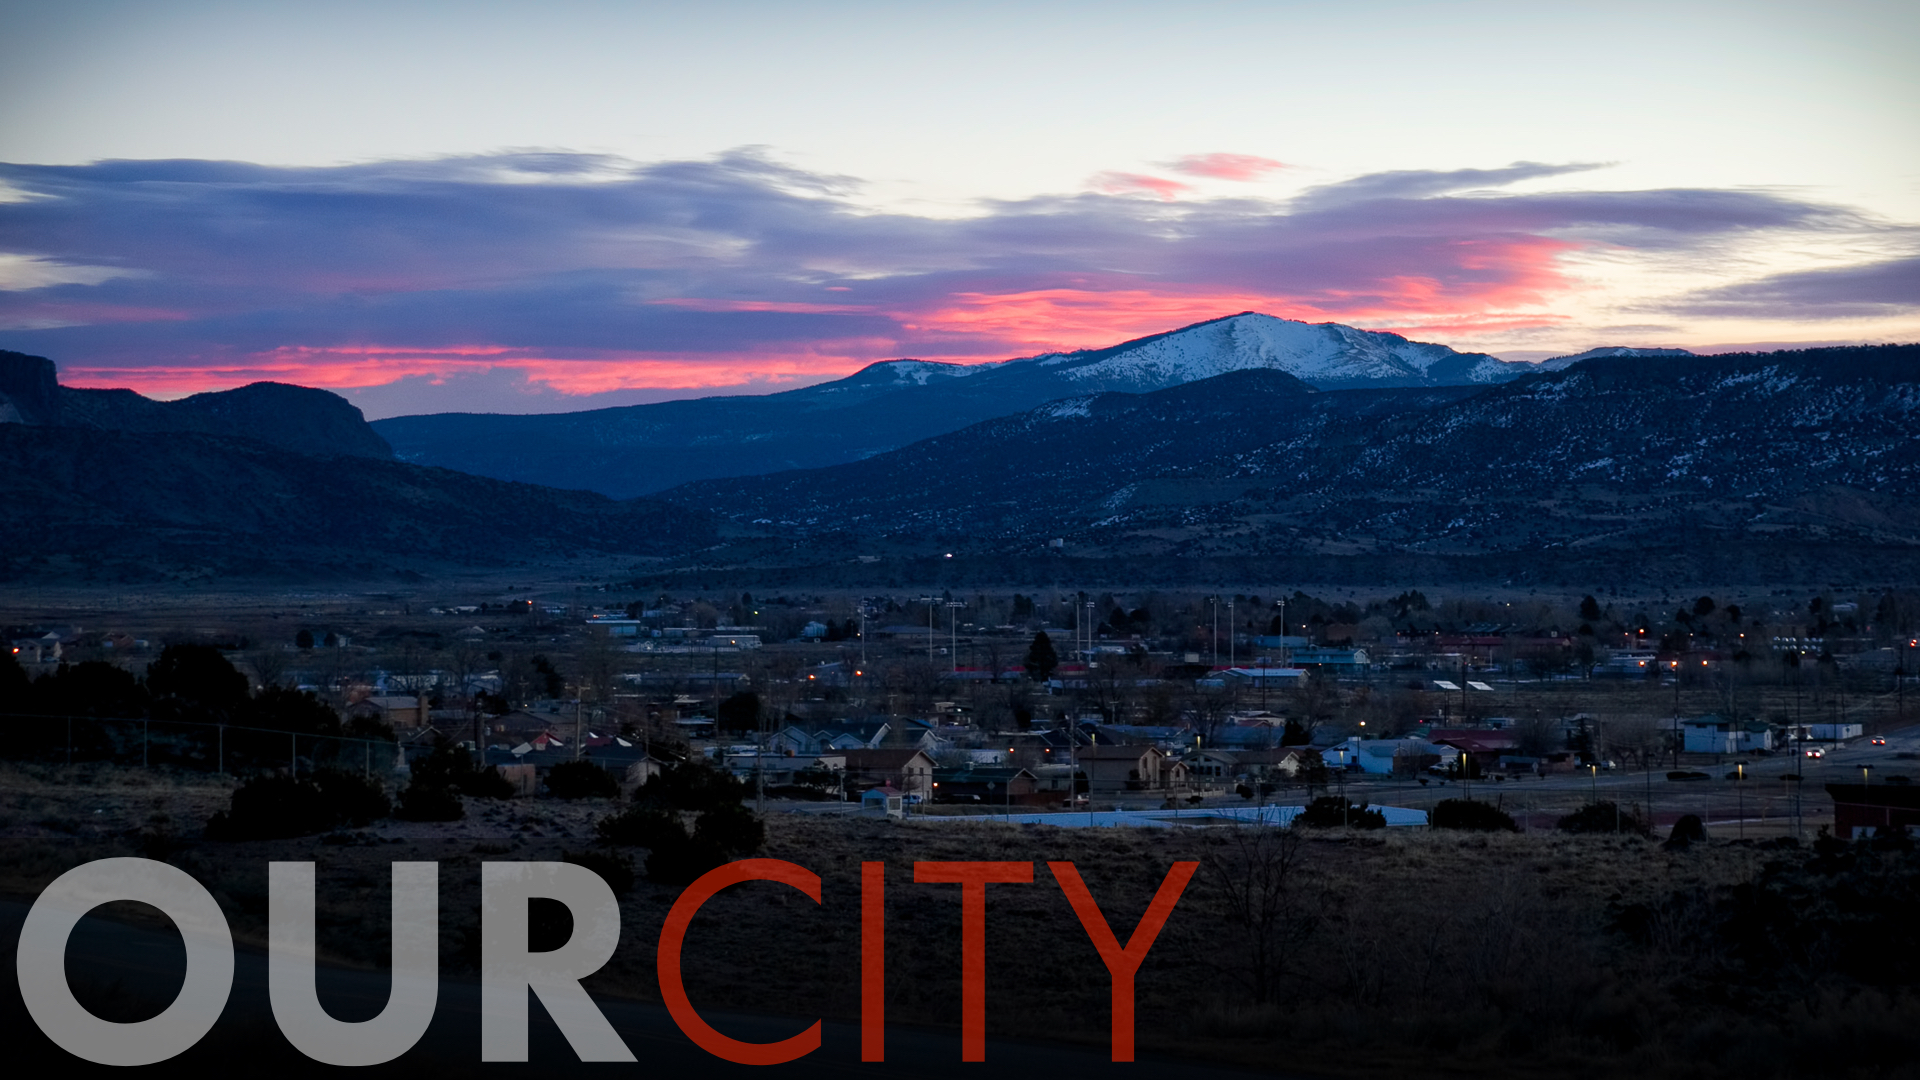 our city.001.jpg